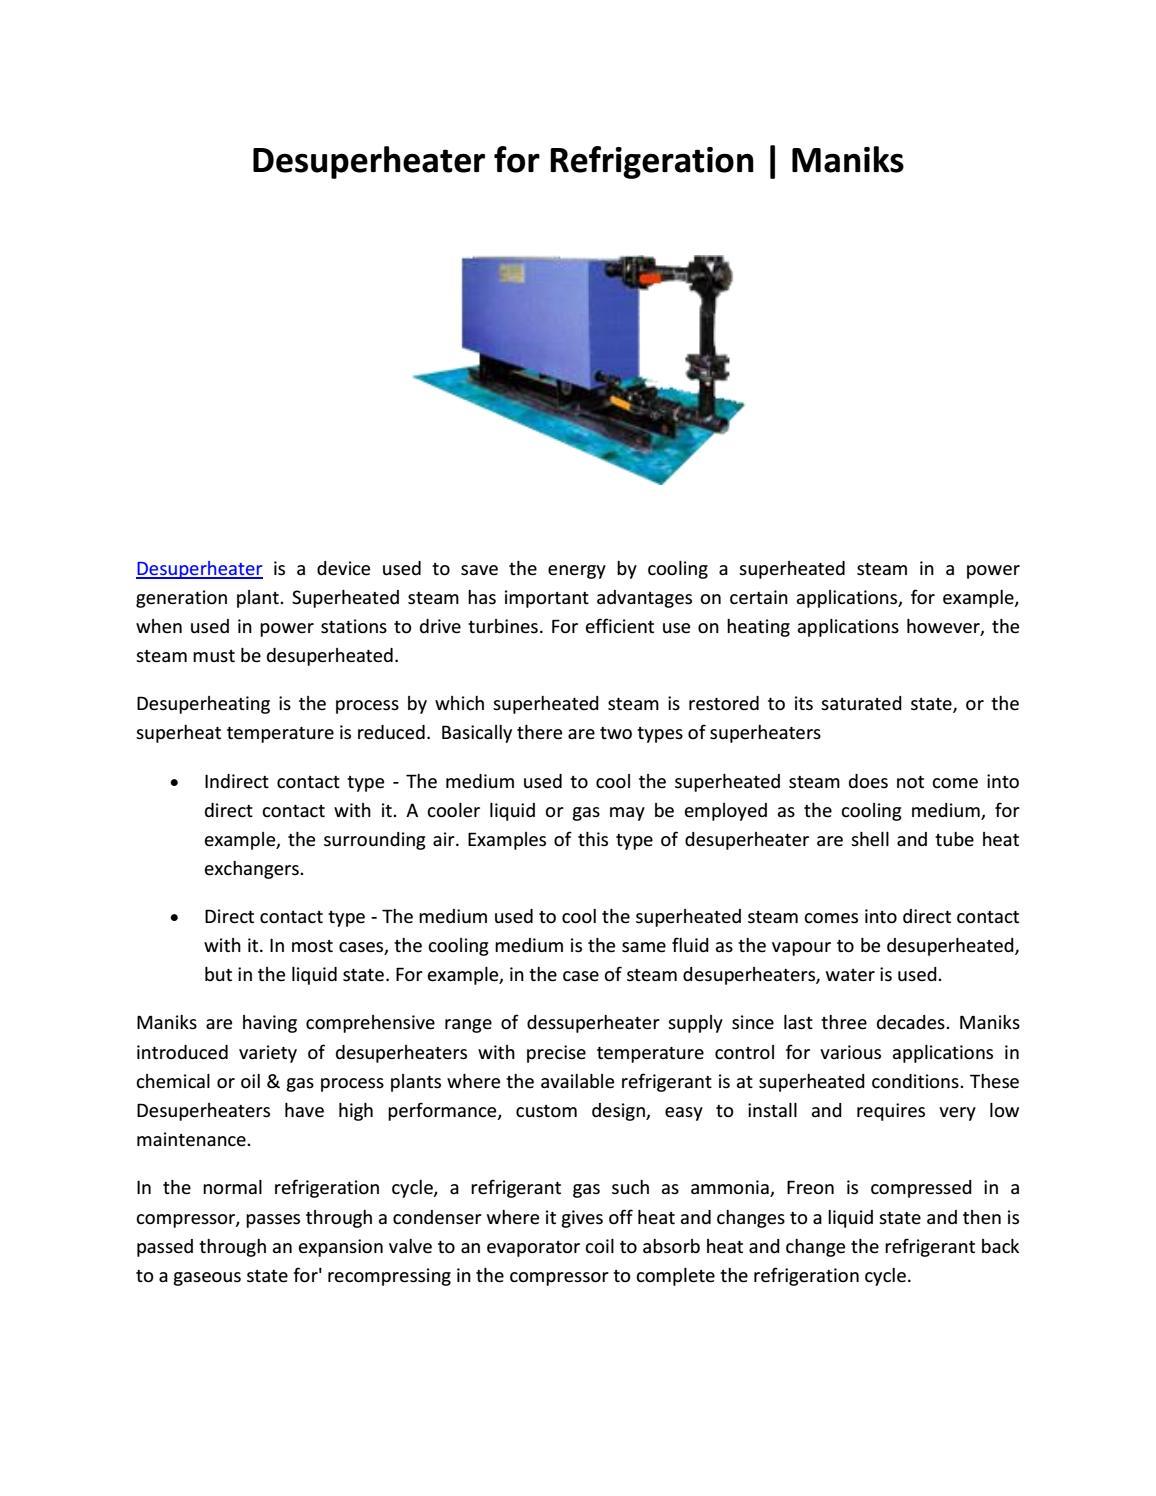 Desuperheater for refrigeration maniks by Nikita patil - issuu